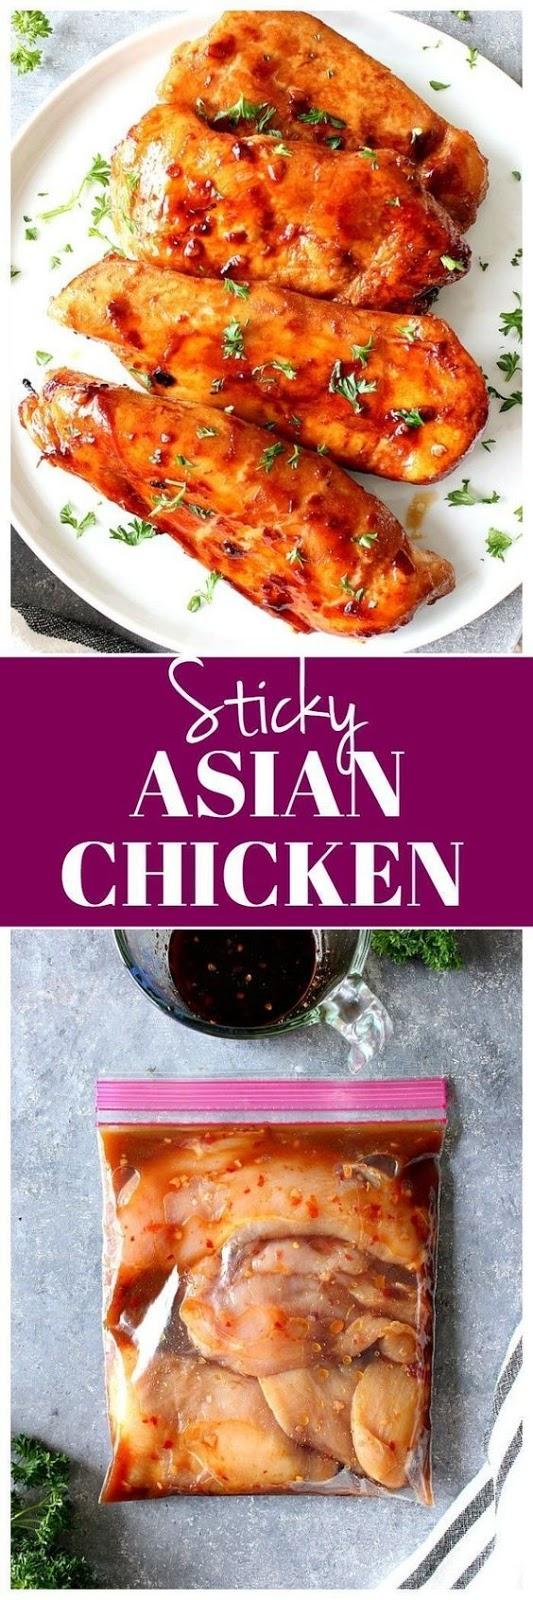 Sticky Asian Chicken recipe